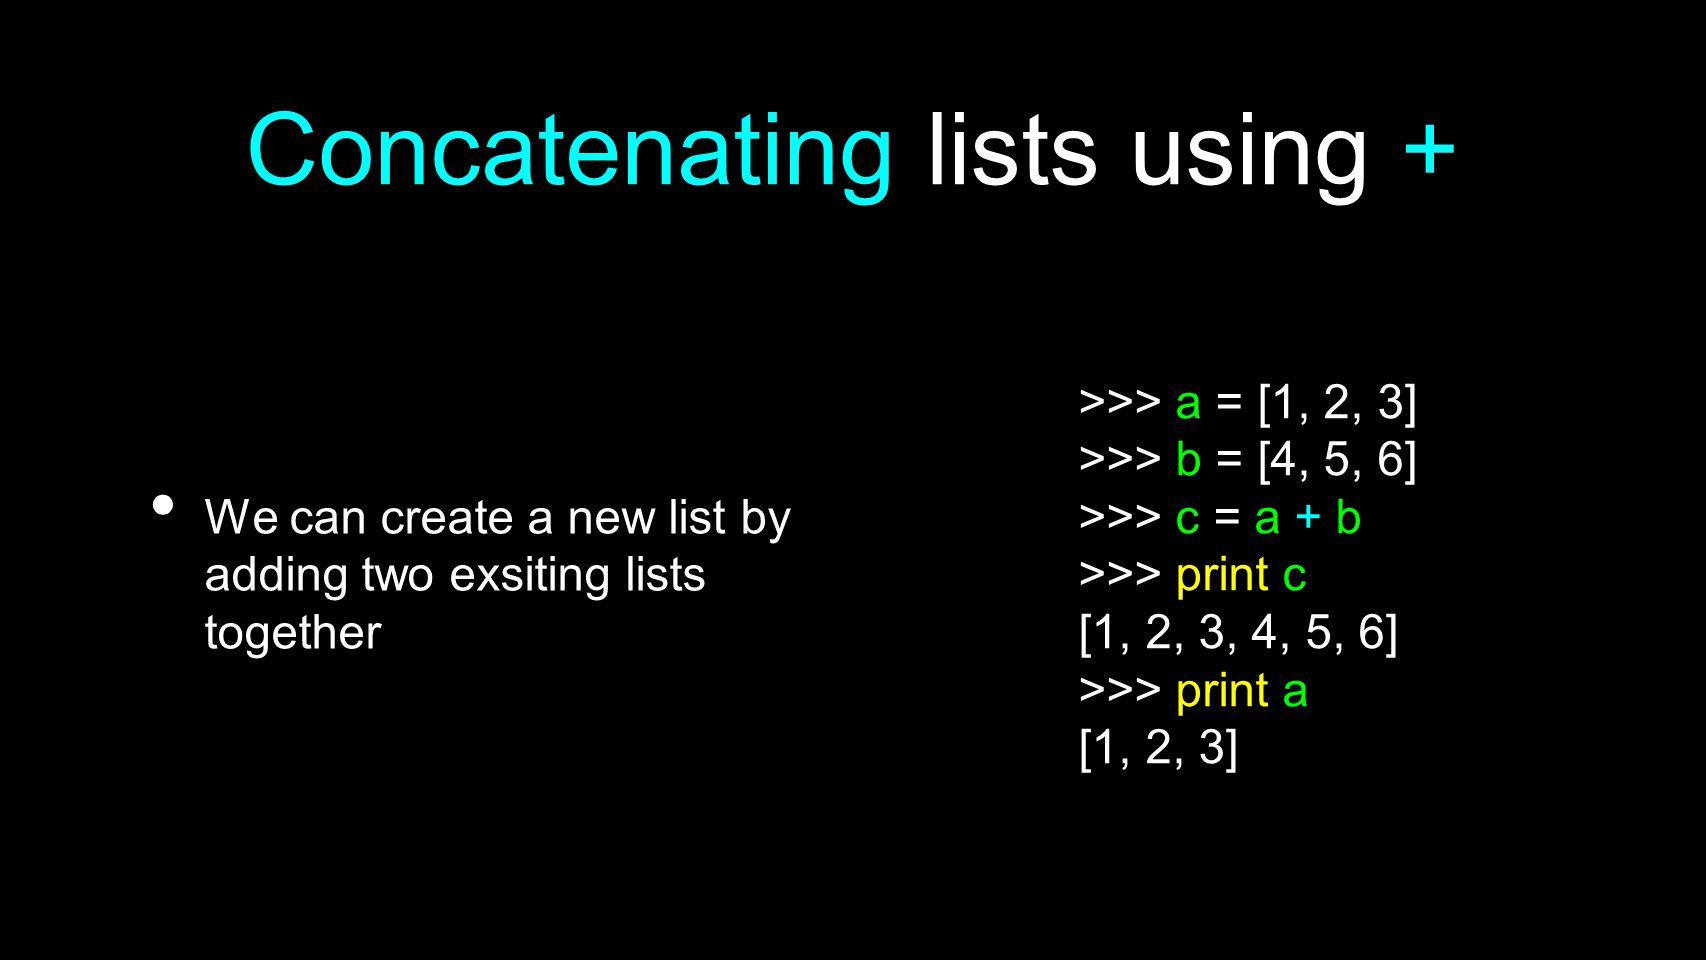 Concatenating lists using +